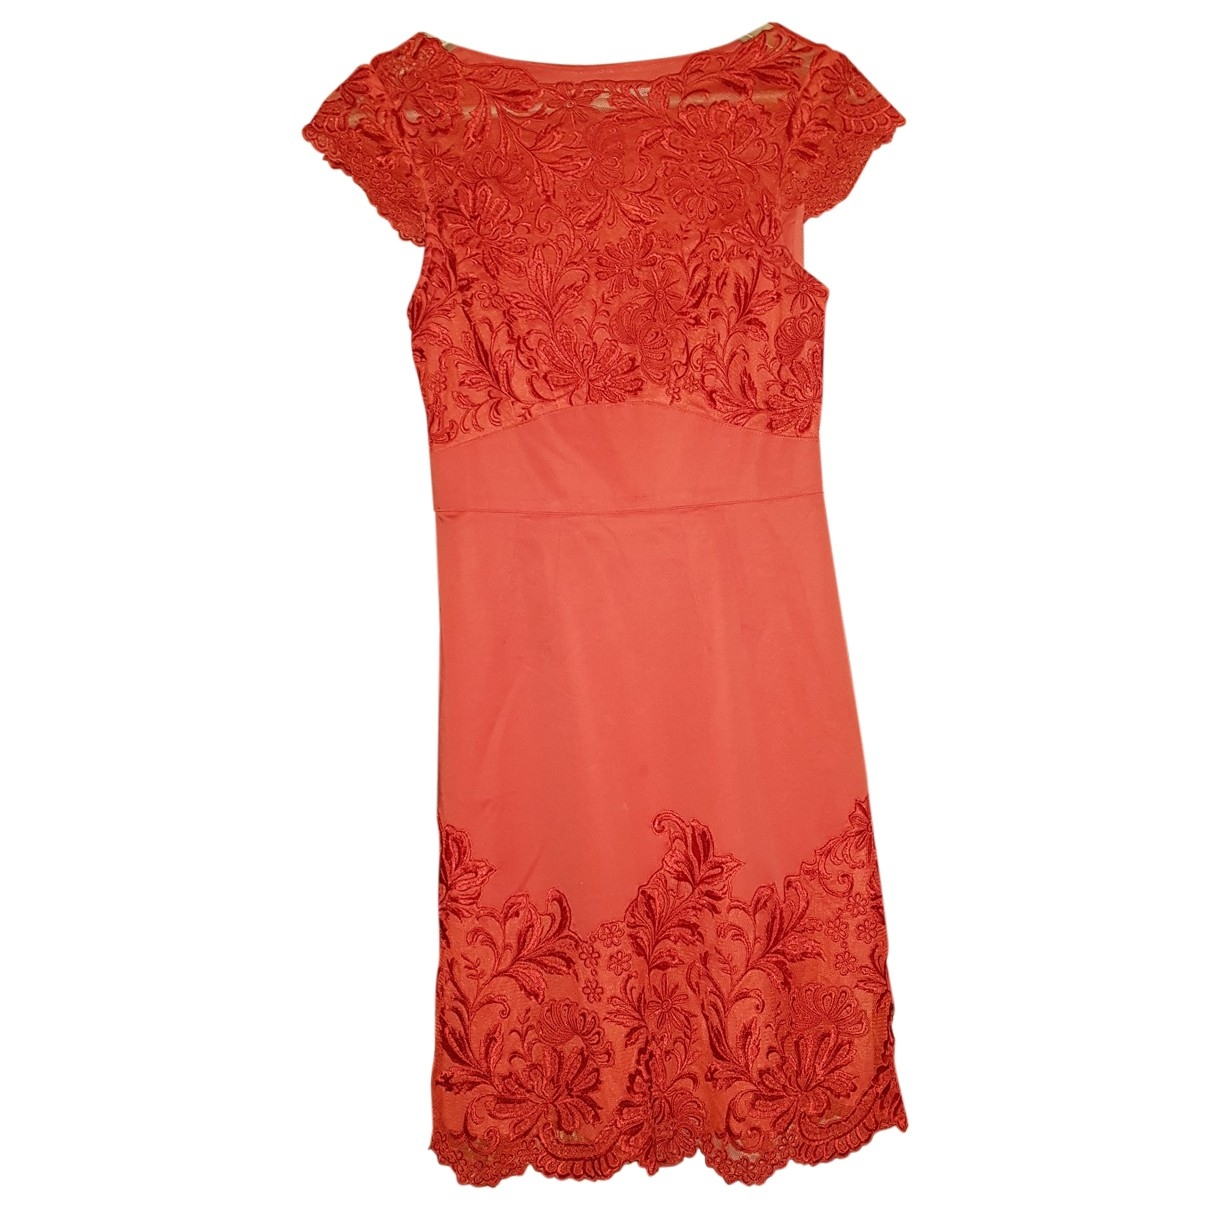 Karen Millen \N Kleid in  Rot Polyester